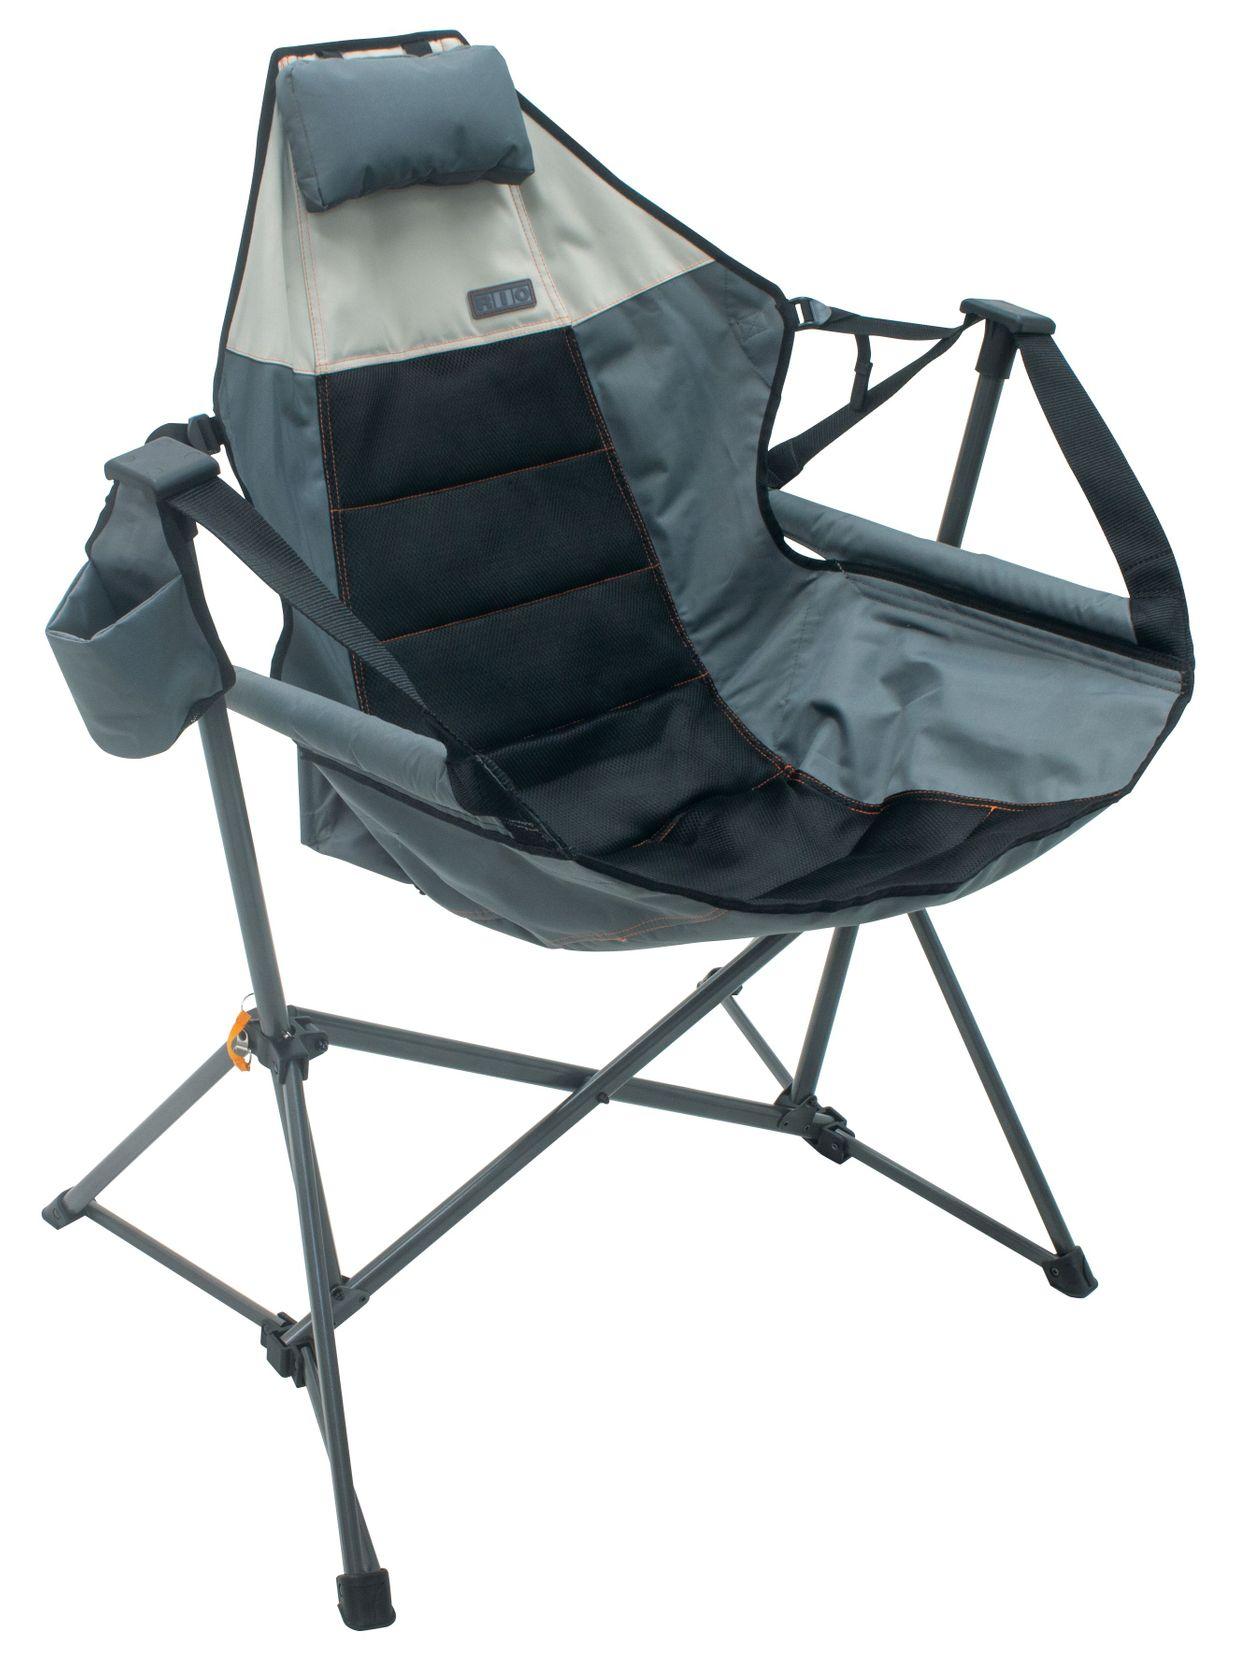 Rio Brands Swinging Hammock Chair